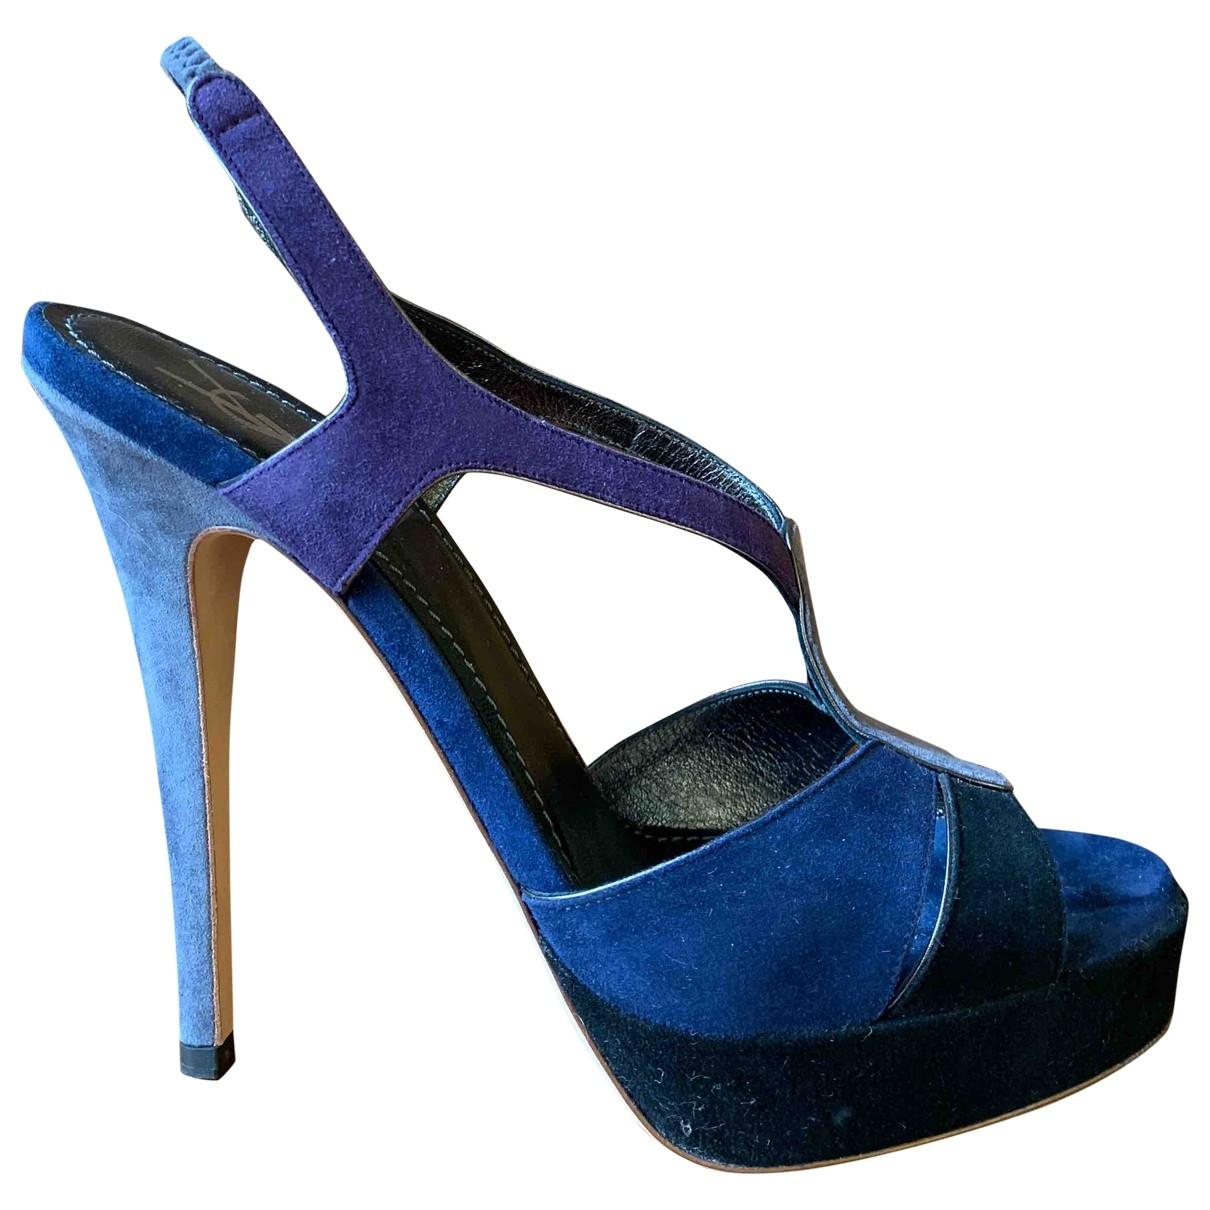 Yves Saint Laurent Tribute Navy Suede Sandals for Women 38.5 EU